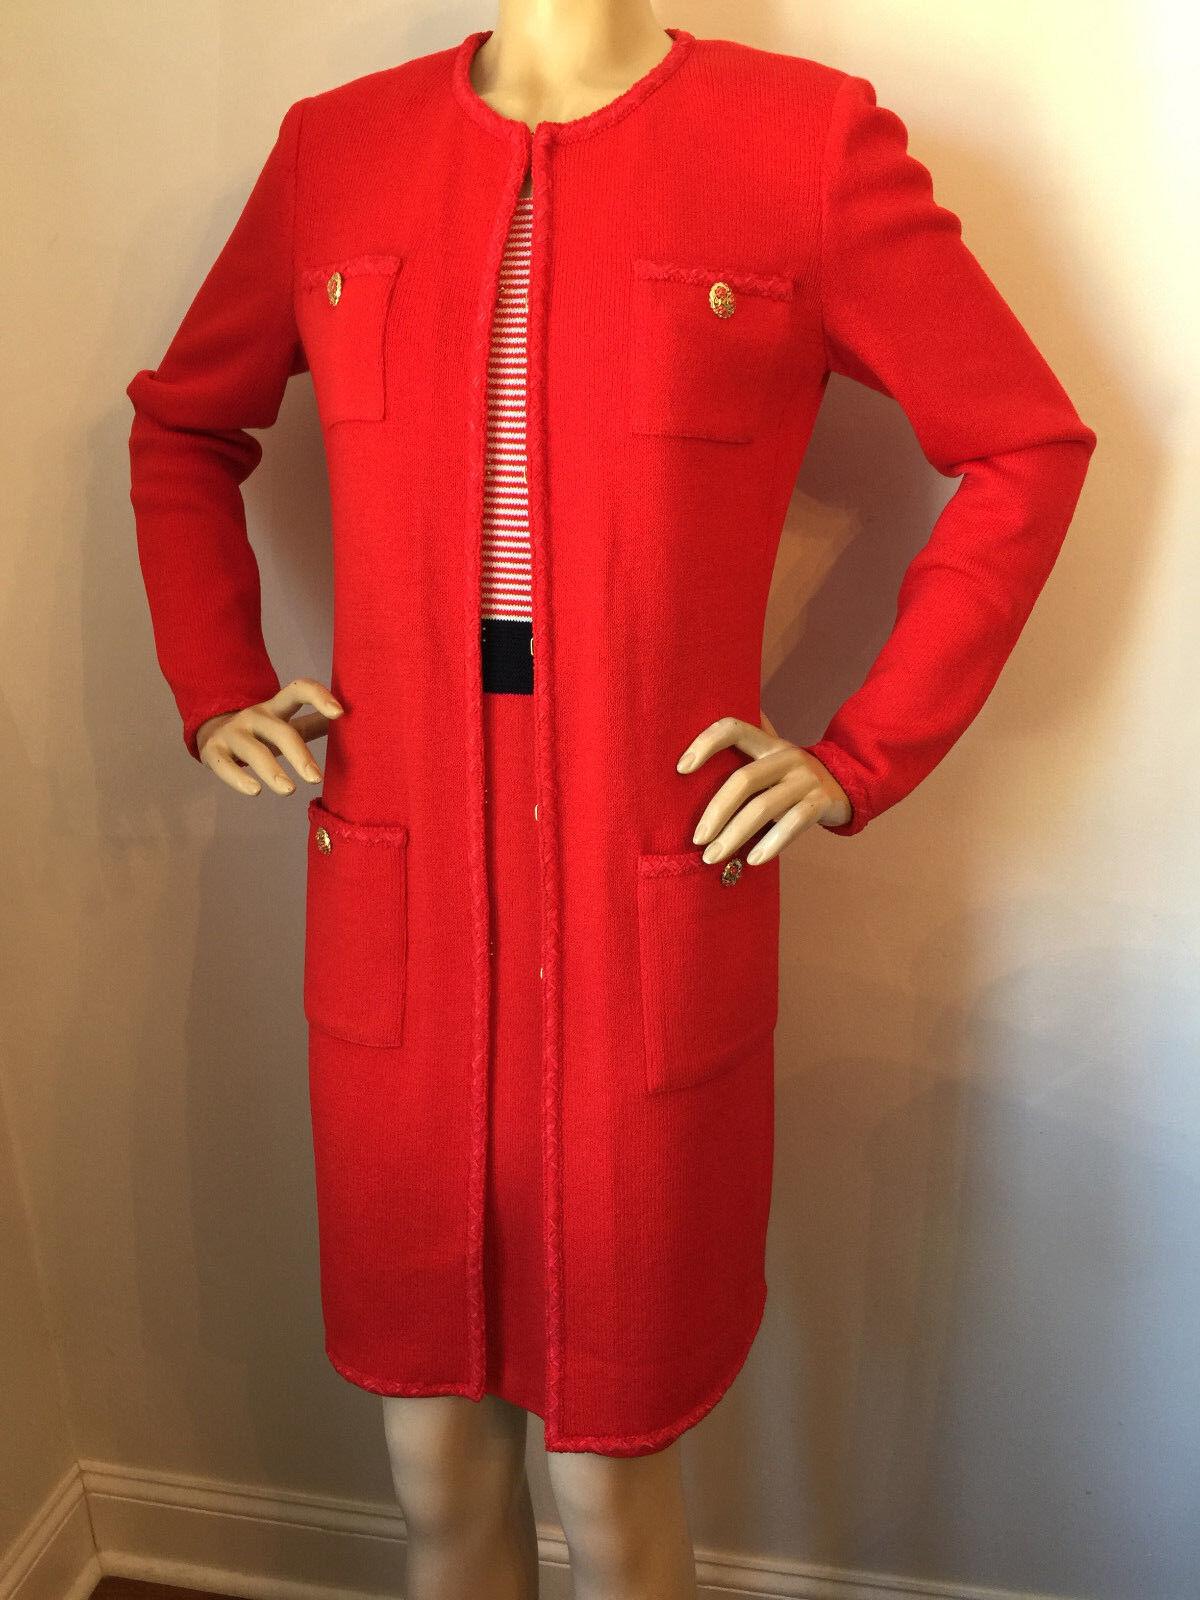 NWT St John Knit dress & topper red sea coral & navy size 6 8 santana